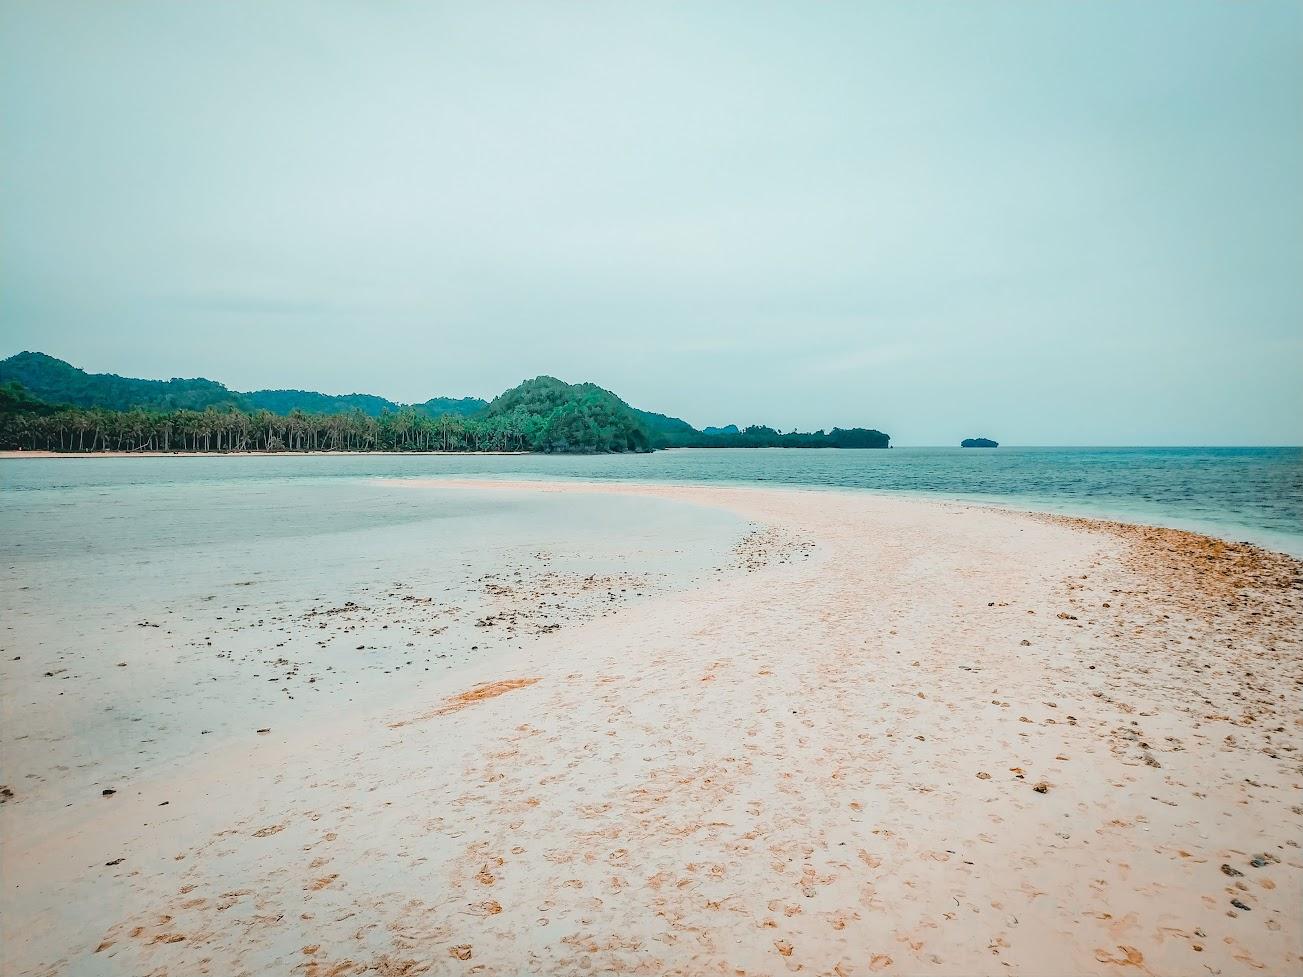 siargao-travel-guide-kawhagan-island-and-sugba-lagoon-tour